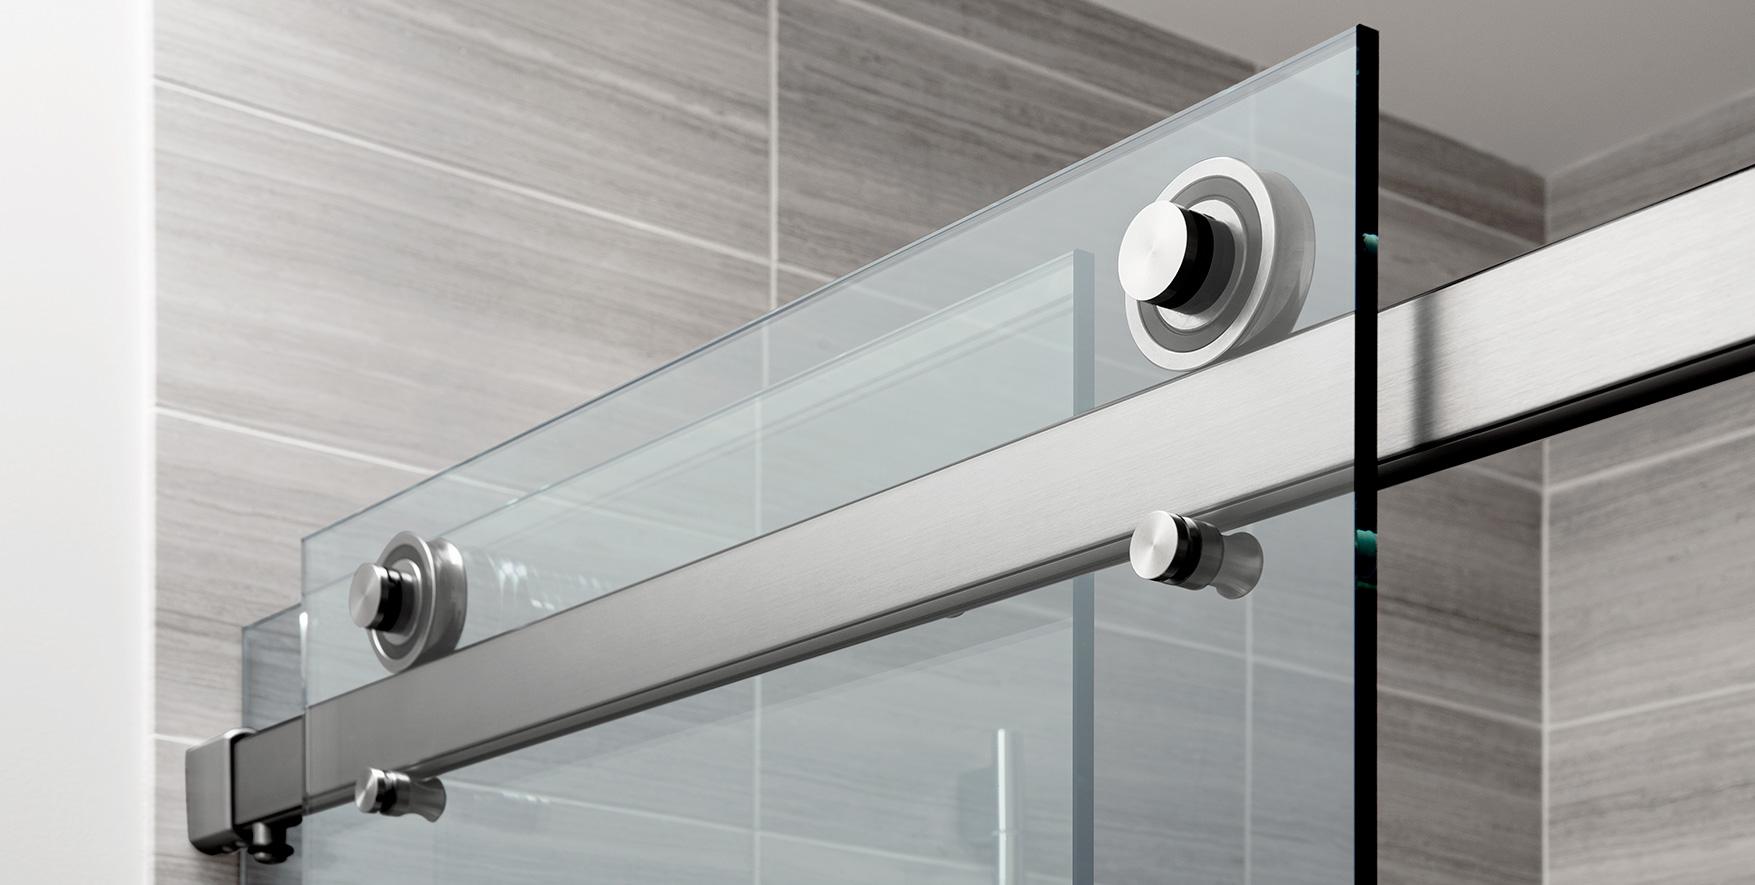 Glass Enclosed Sliding Door Shower System Alcove Installation In  Doppelgänger Haus